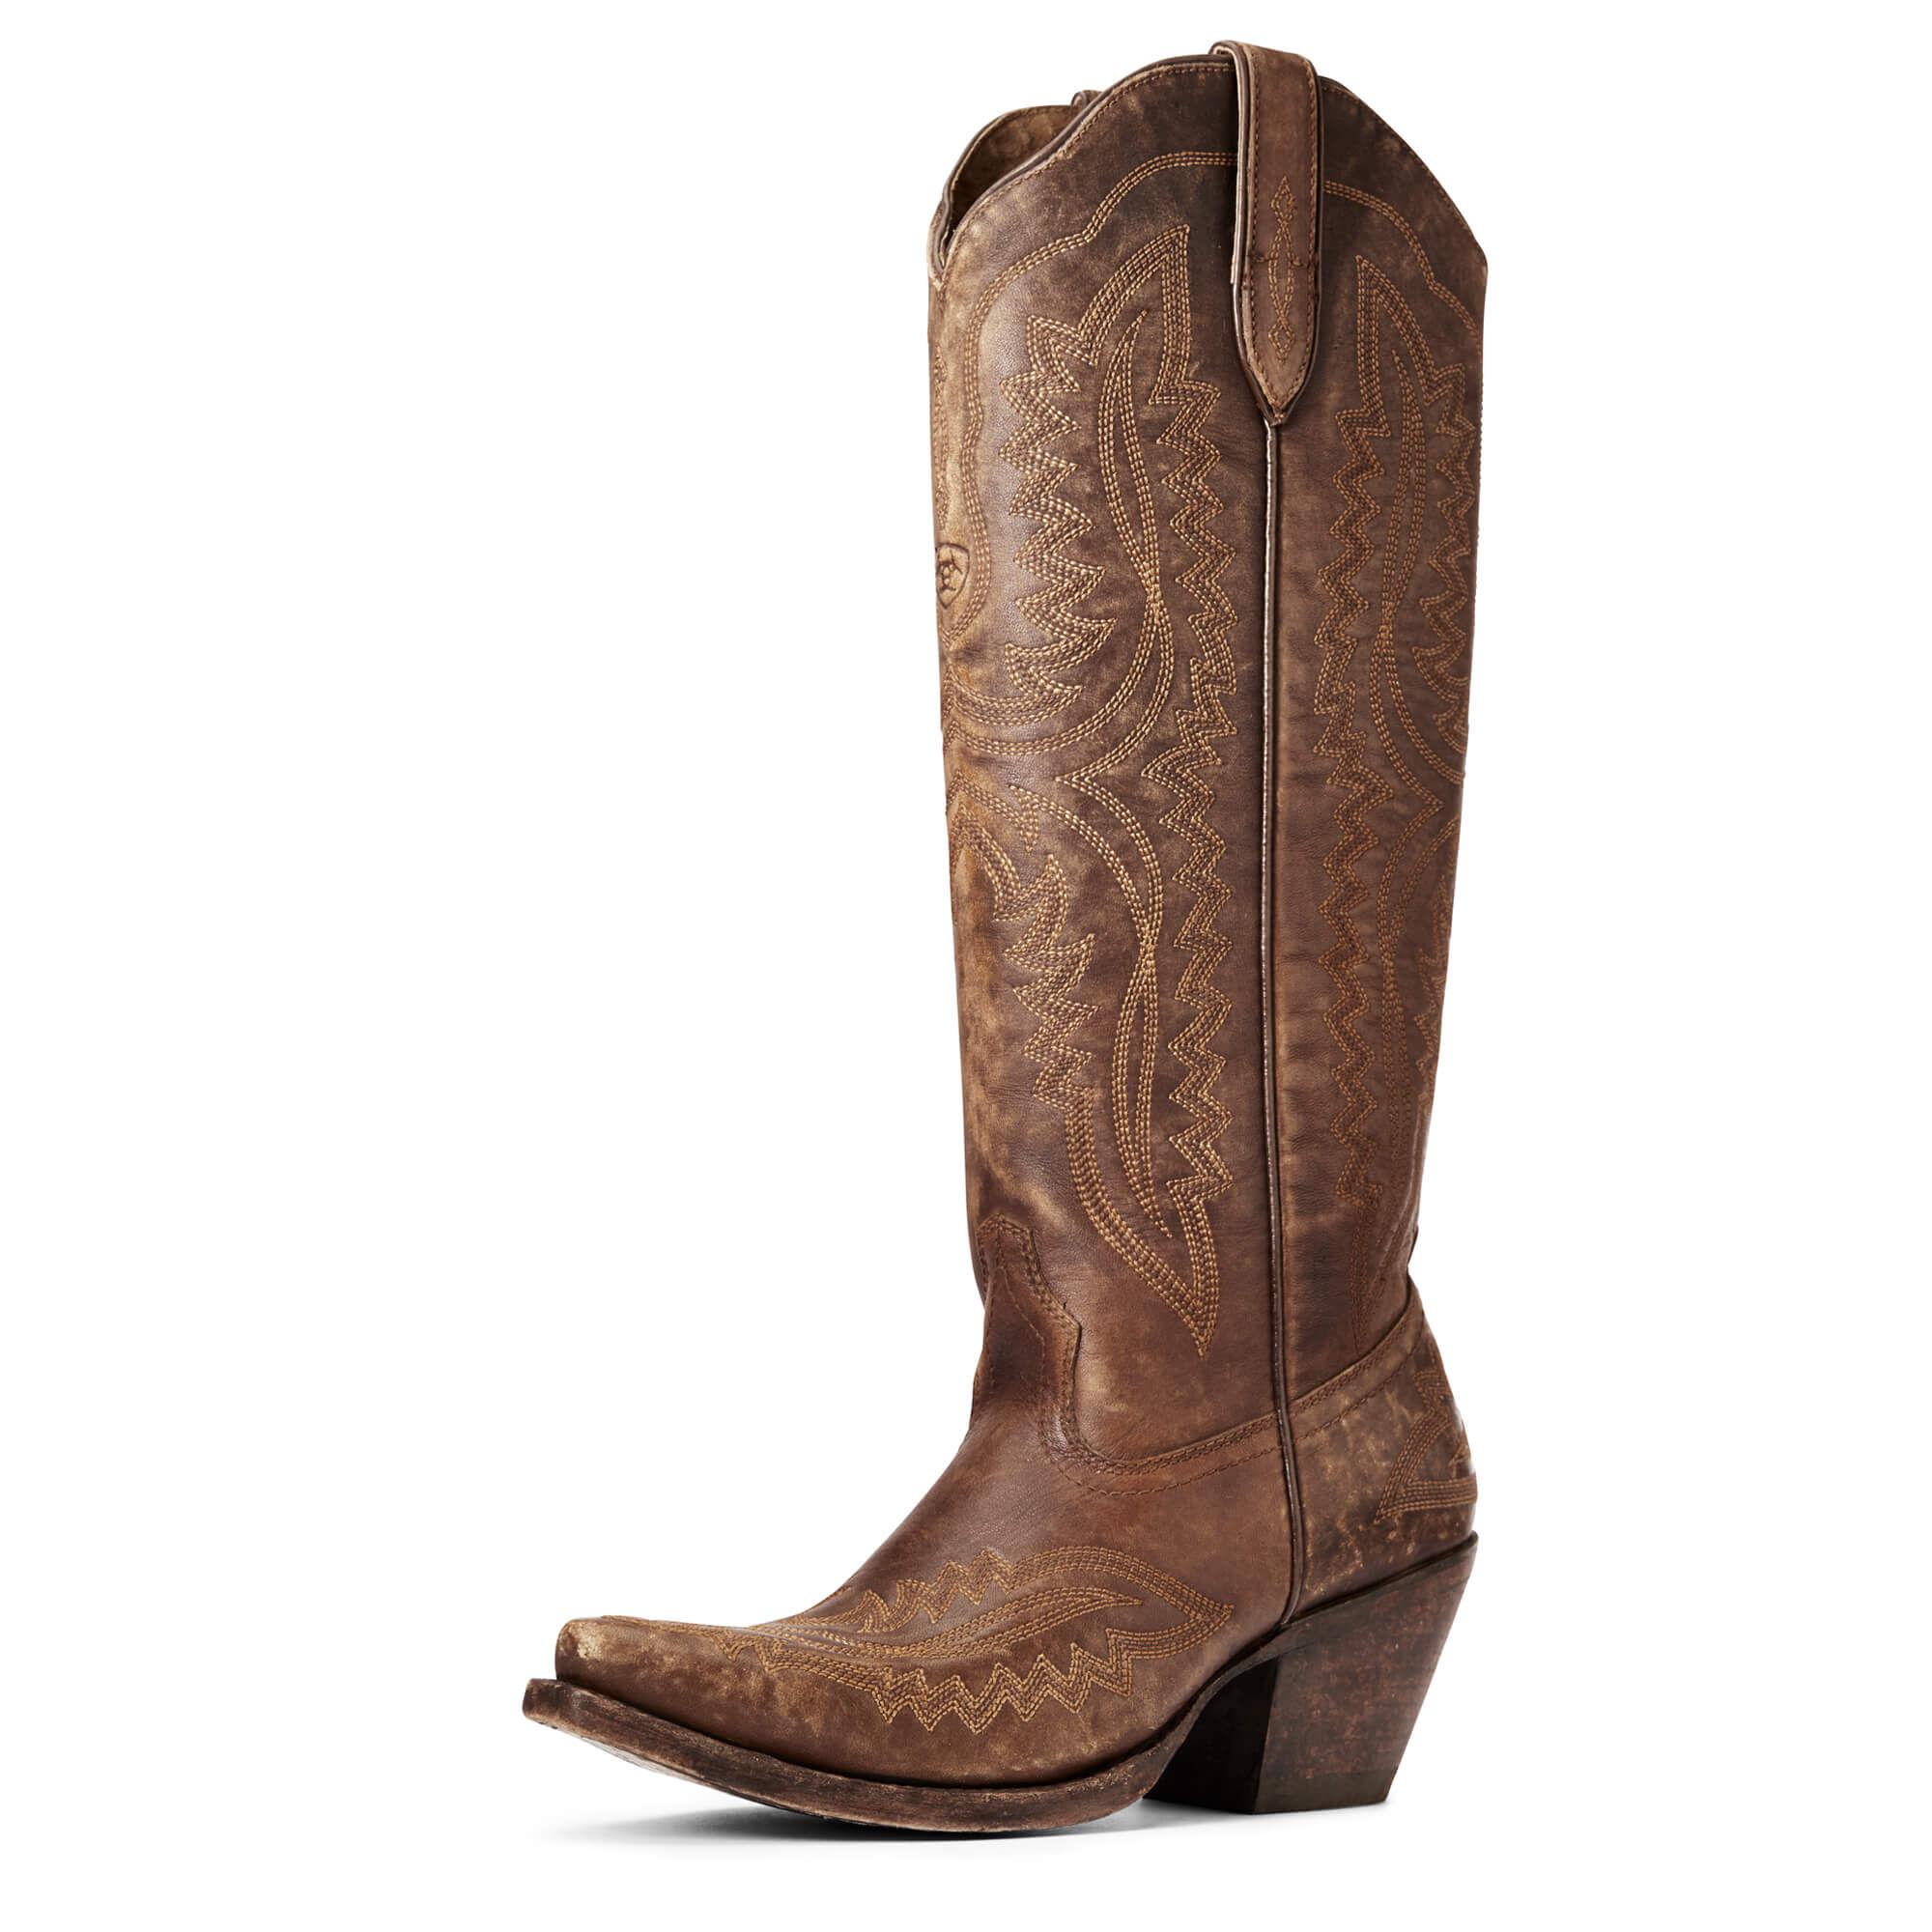 Ariat Women's Apparel and Footwear   Ariat